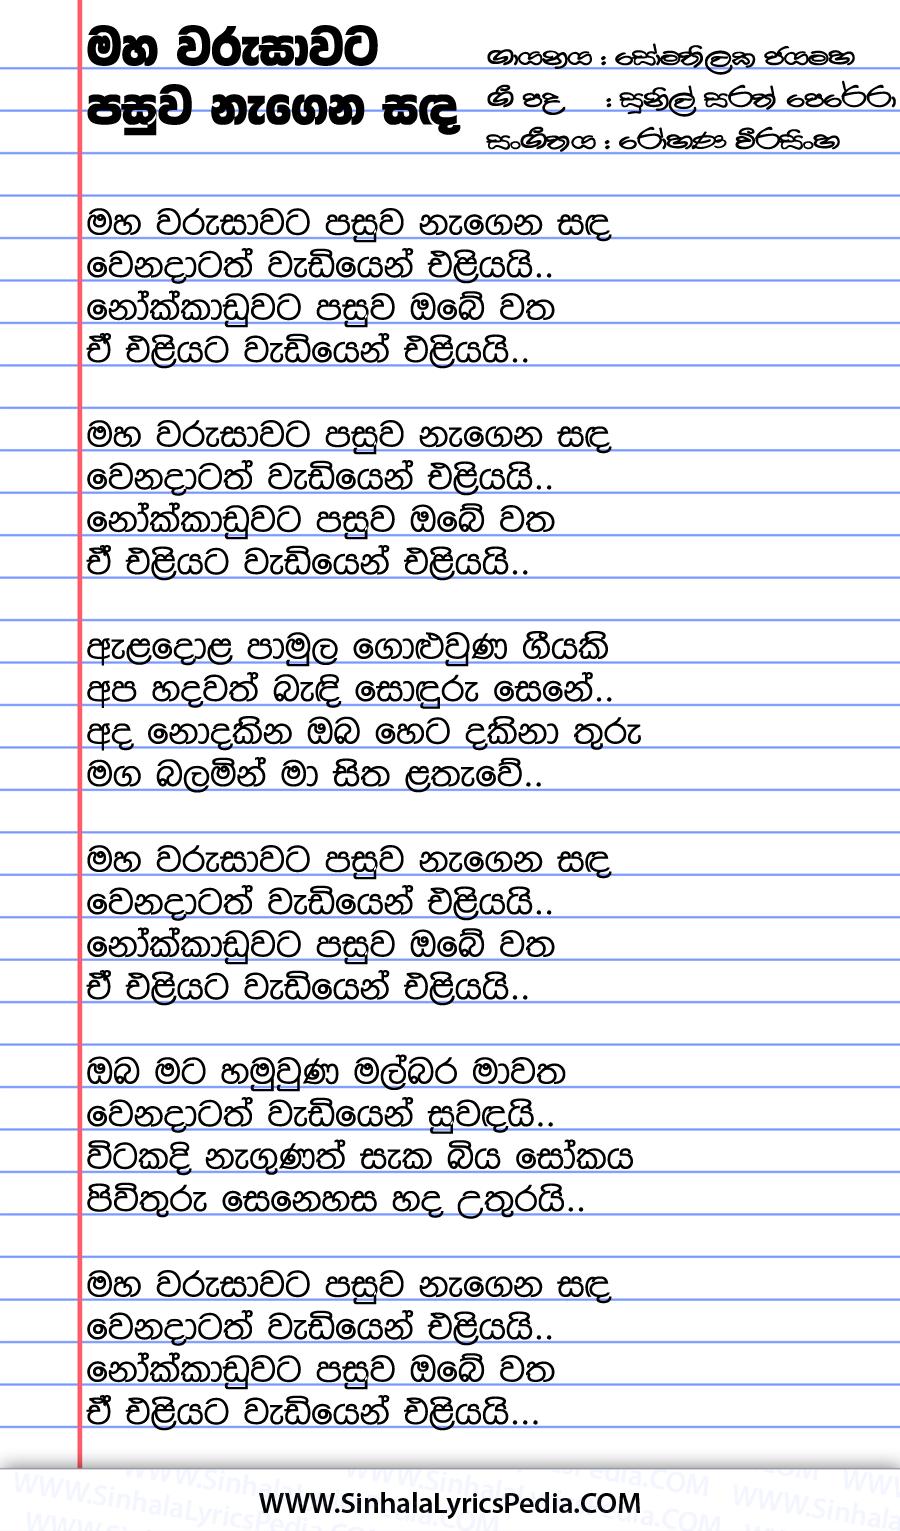 Maha Warusawata Pasuwa Nagena Sanda Song Lyrics